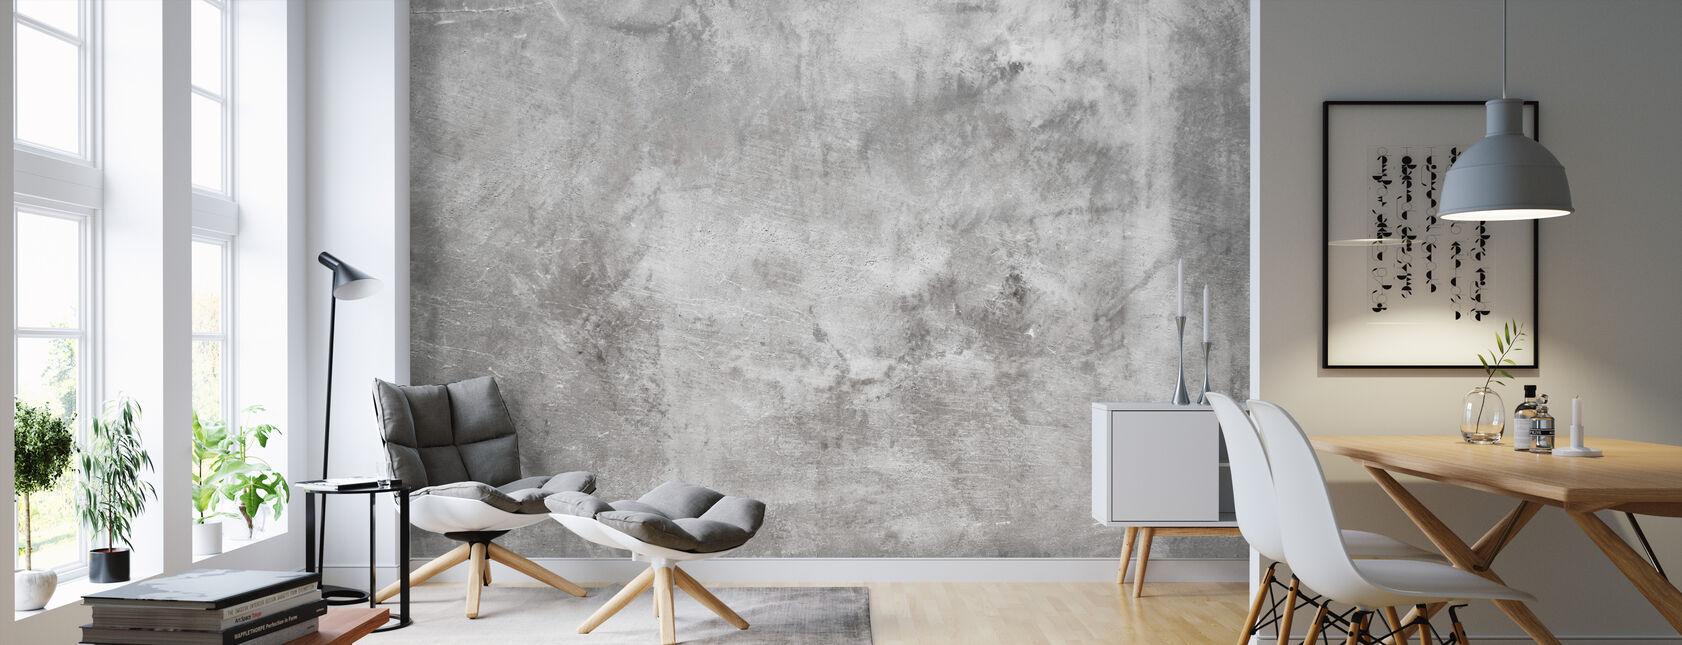 Grungig grov betongvägg - Tapet - Vardagsrum